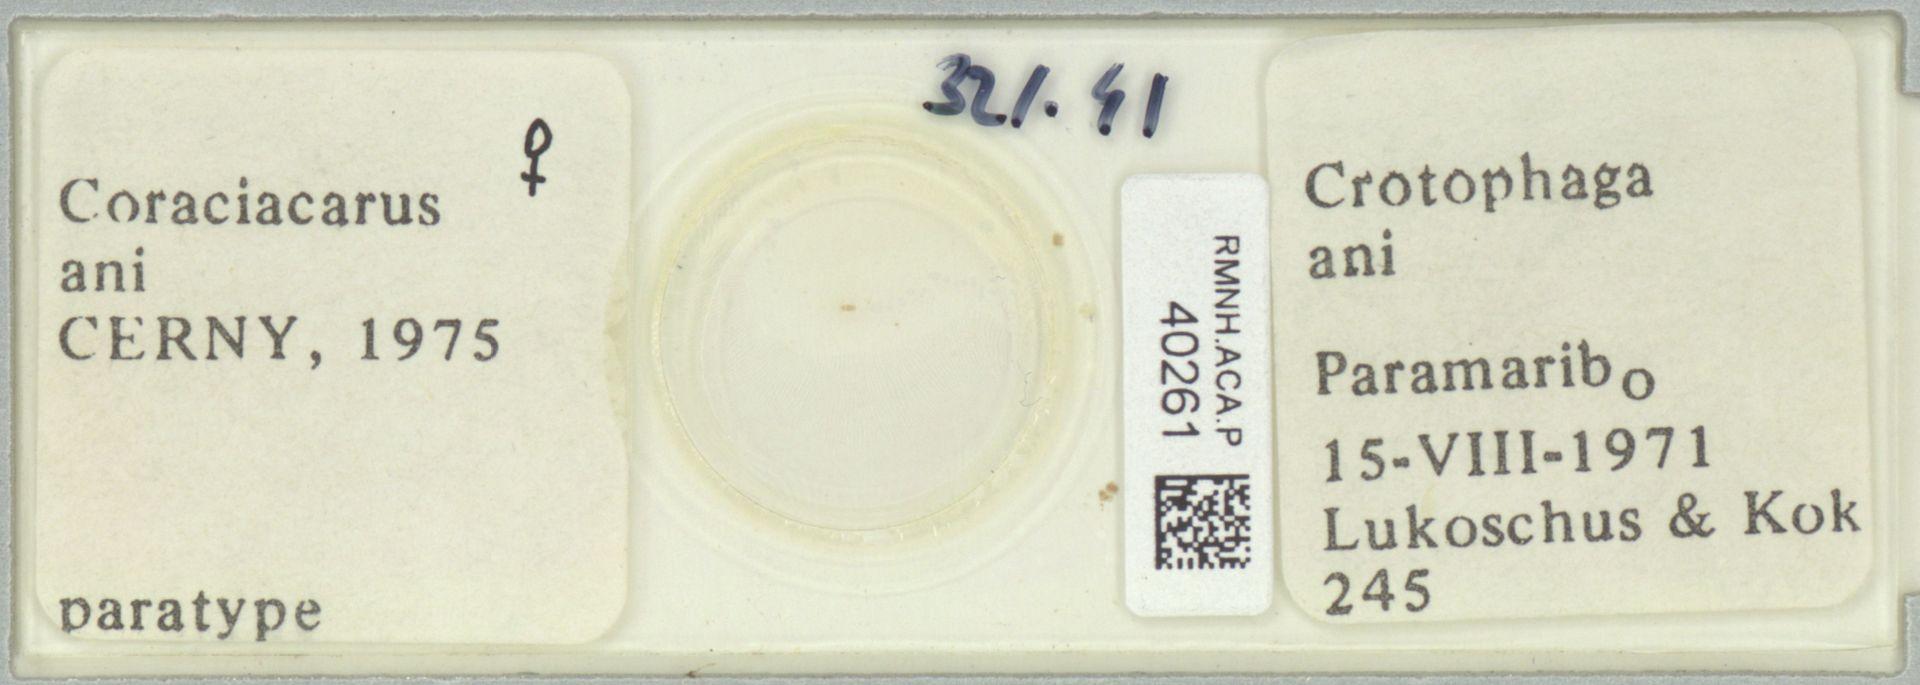 RMNH.ACA.P.40261 | Coraciacarus ani Cerny, 1975